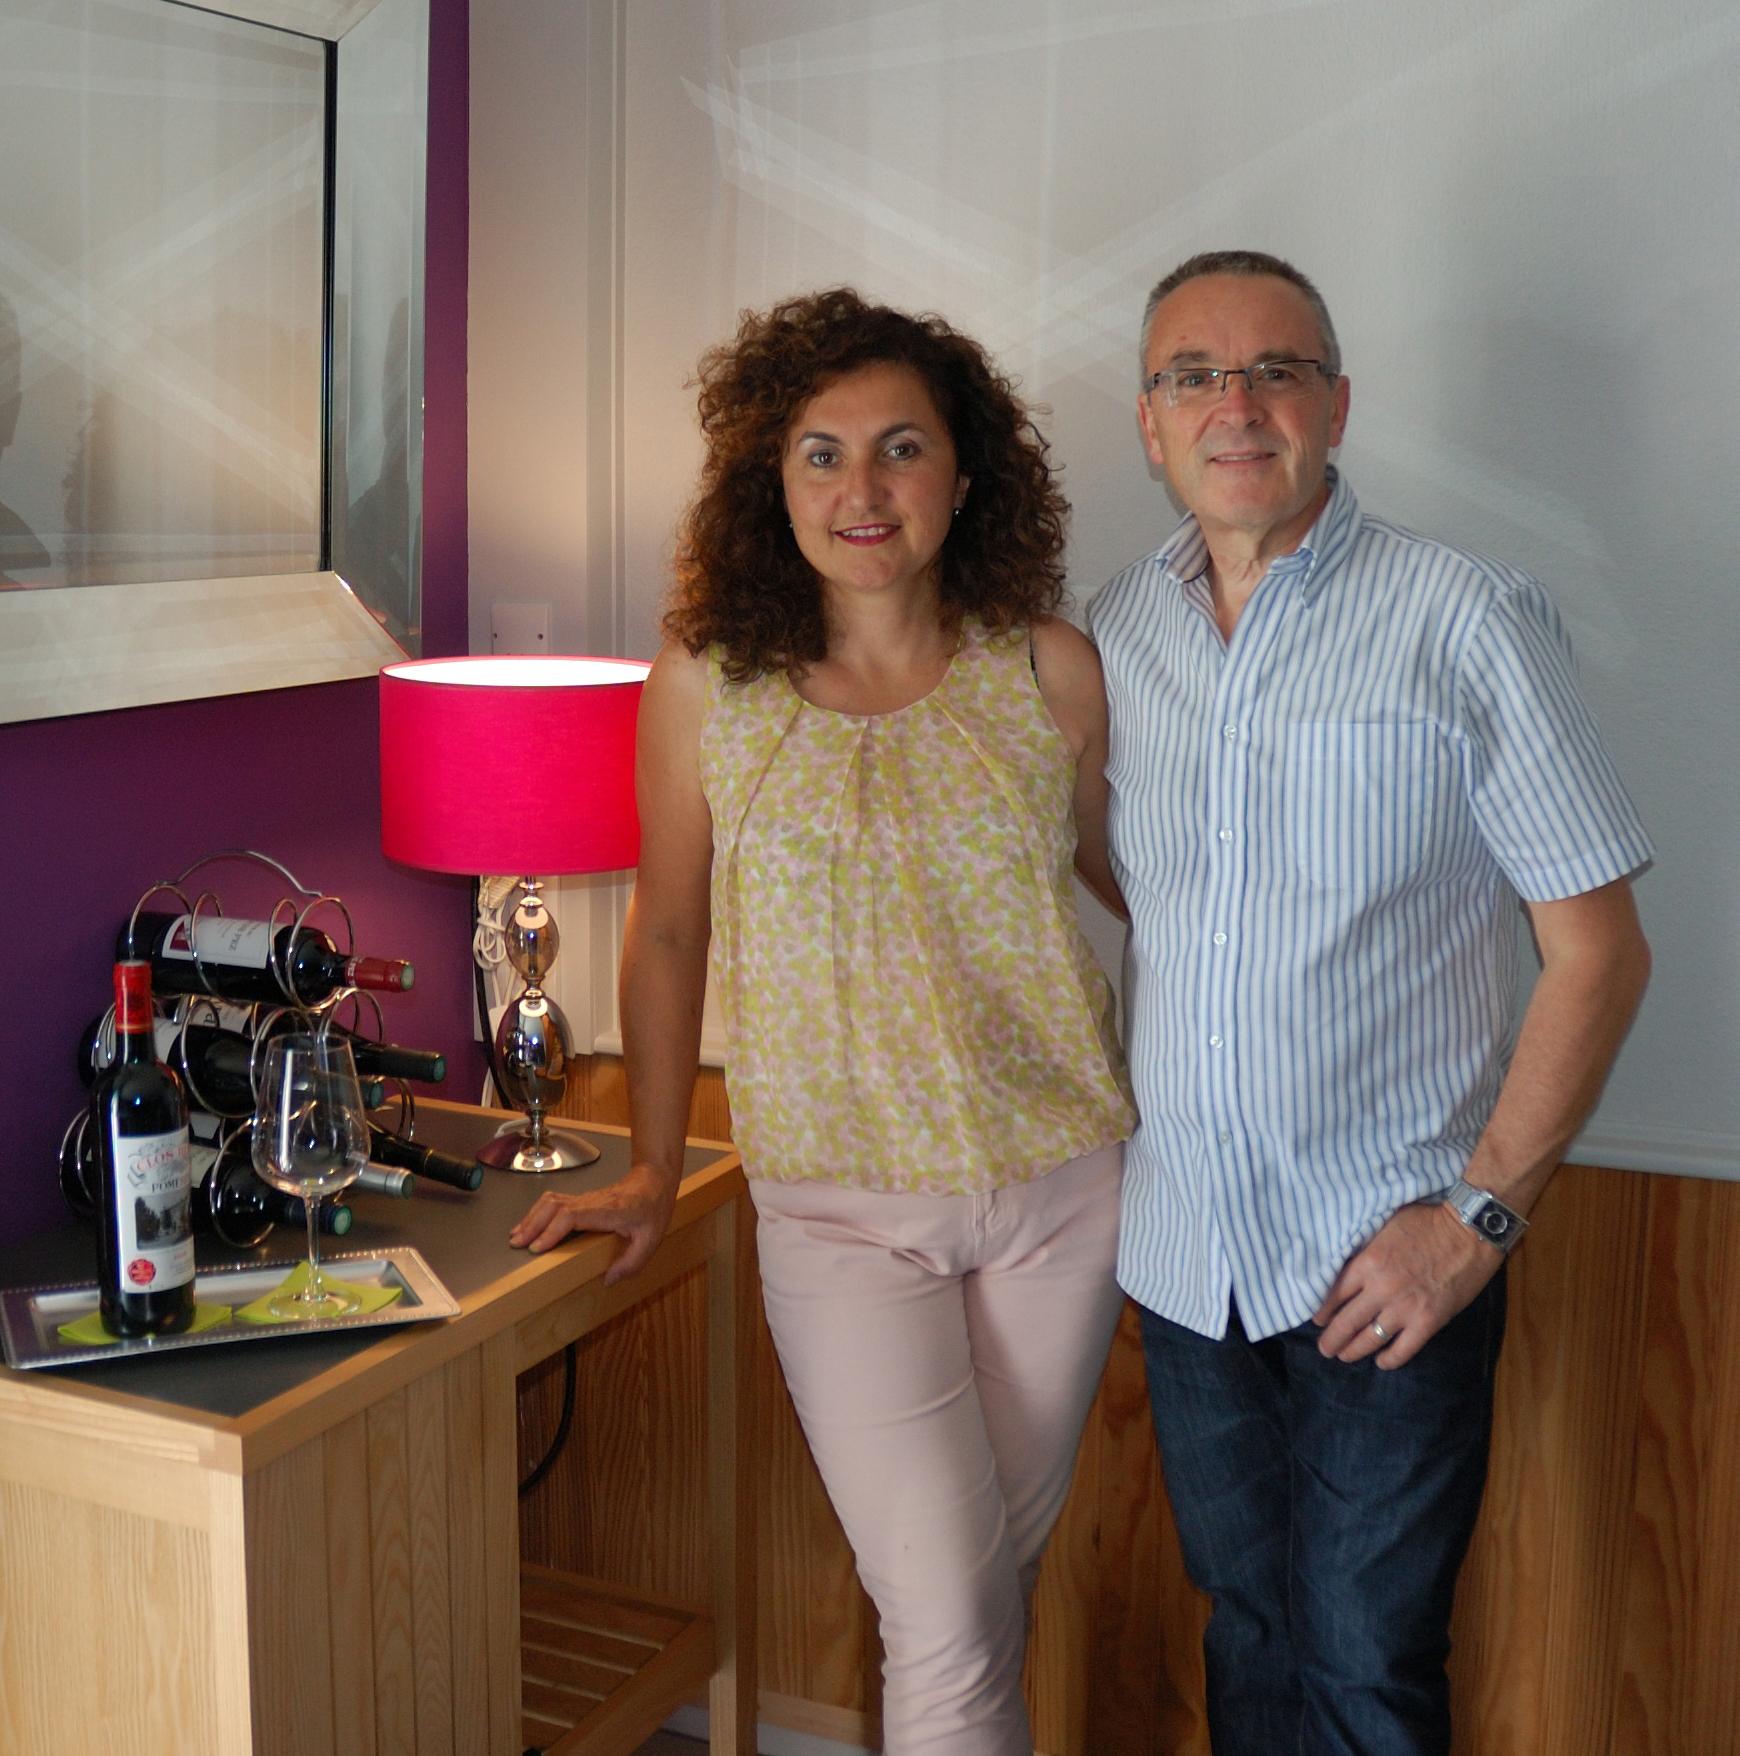 Sophie et Mike Restaurant 40700